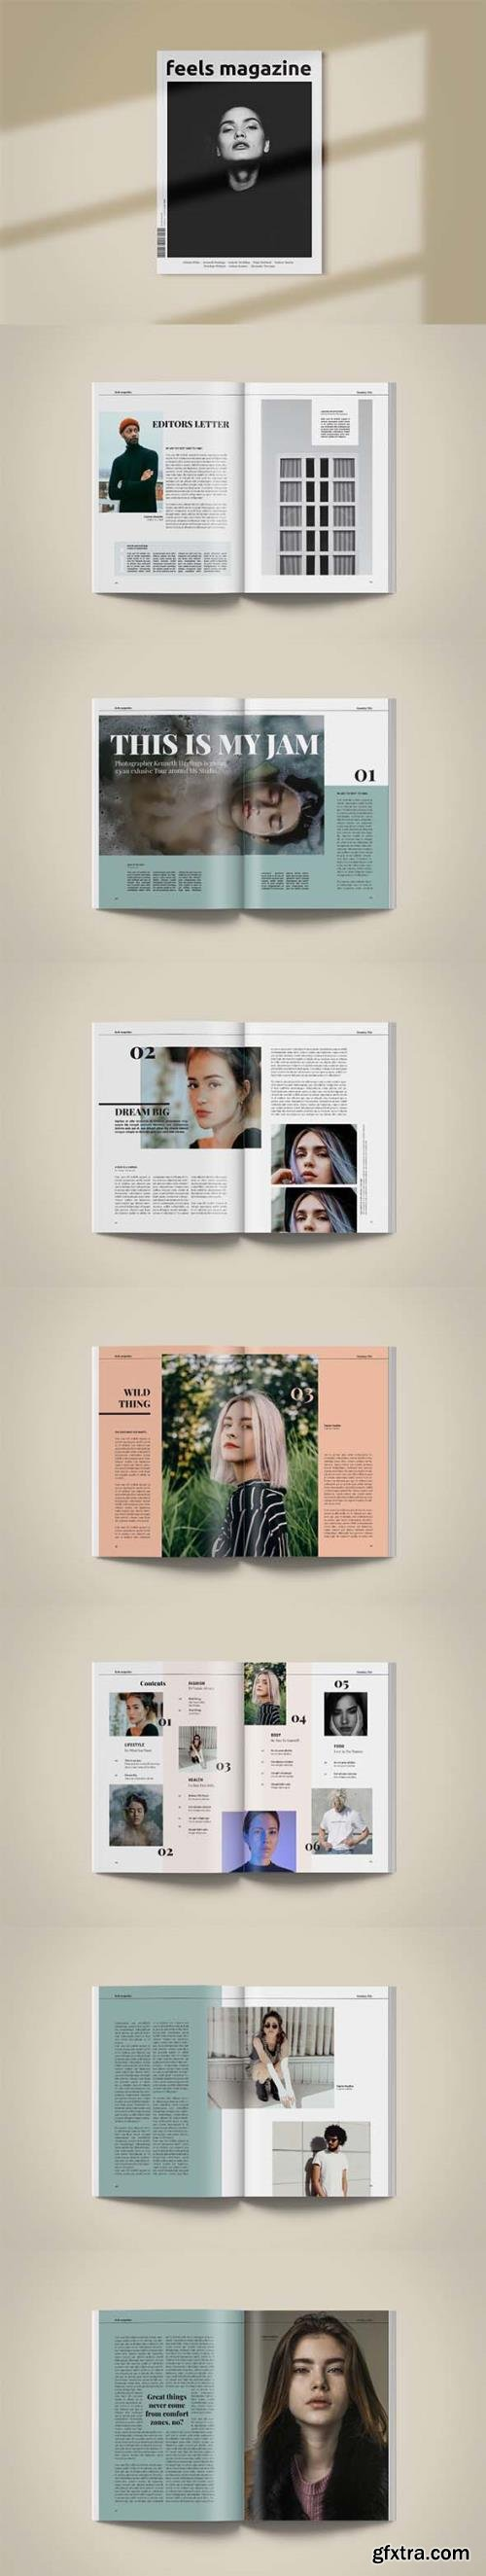 Magazine Template   Feels